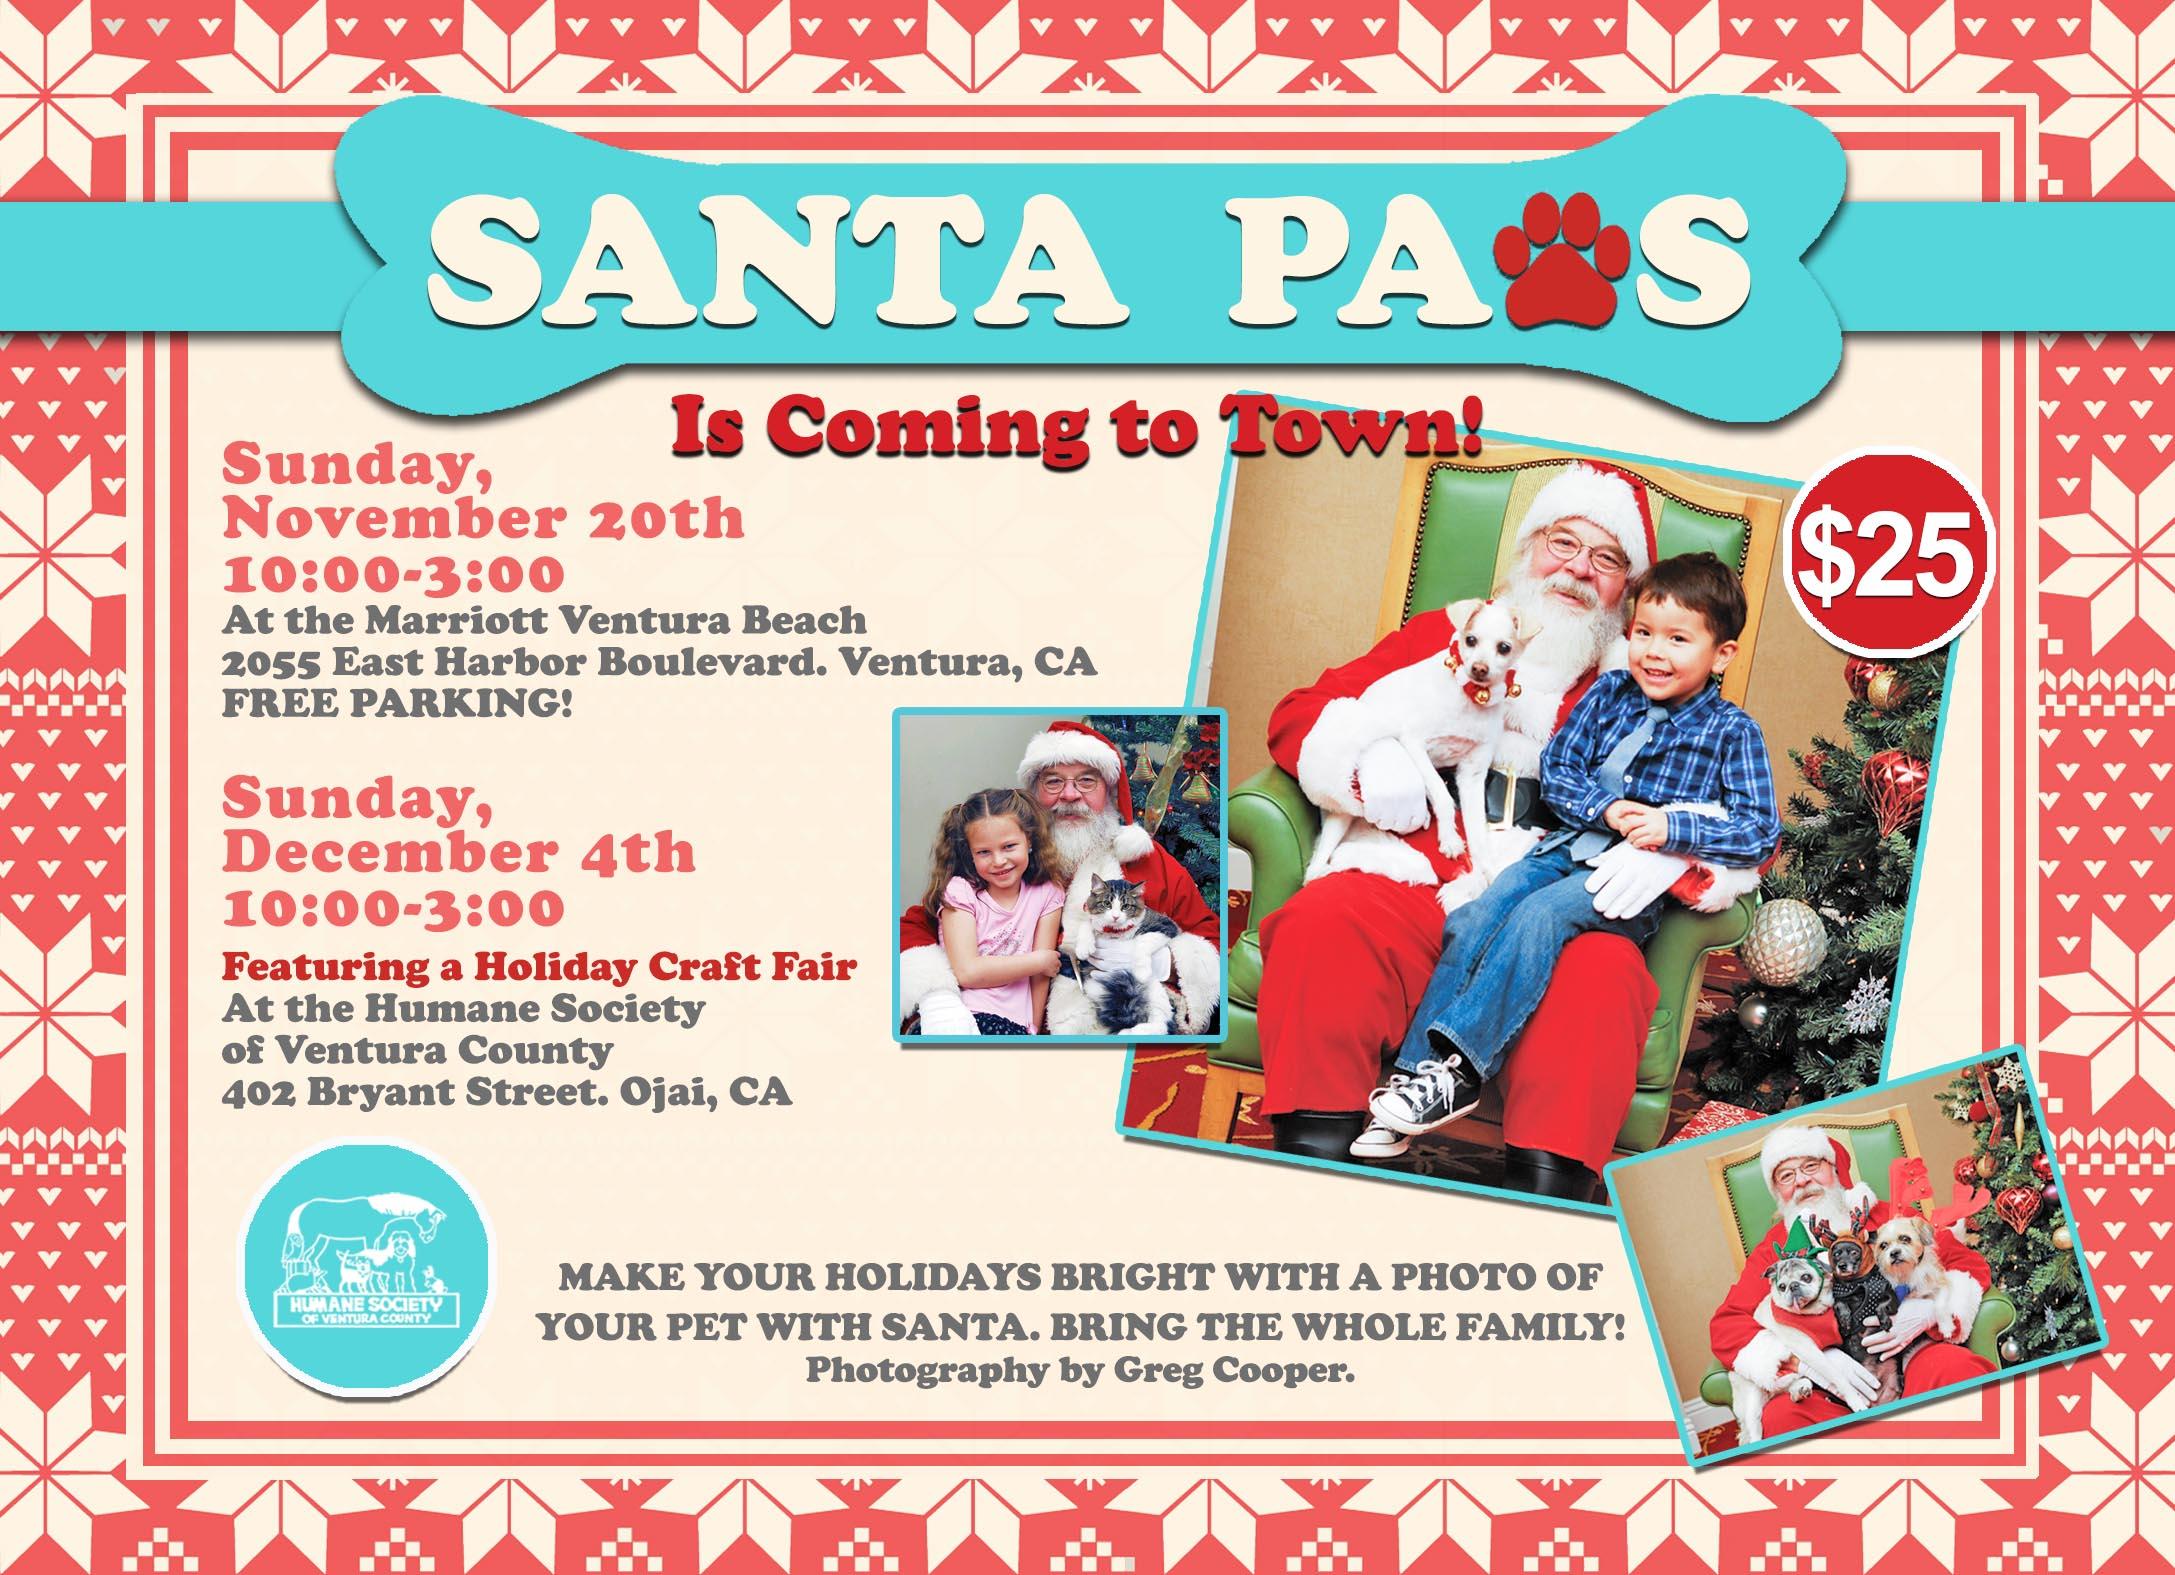 F.Santa.Paws.Postcard.2016.jpg